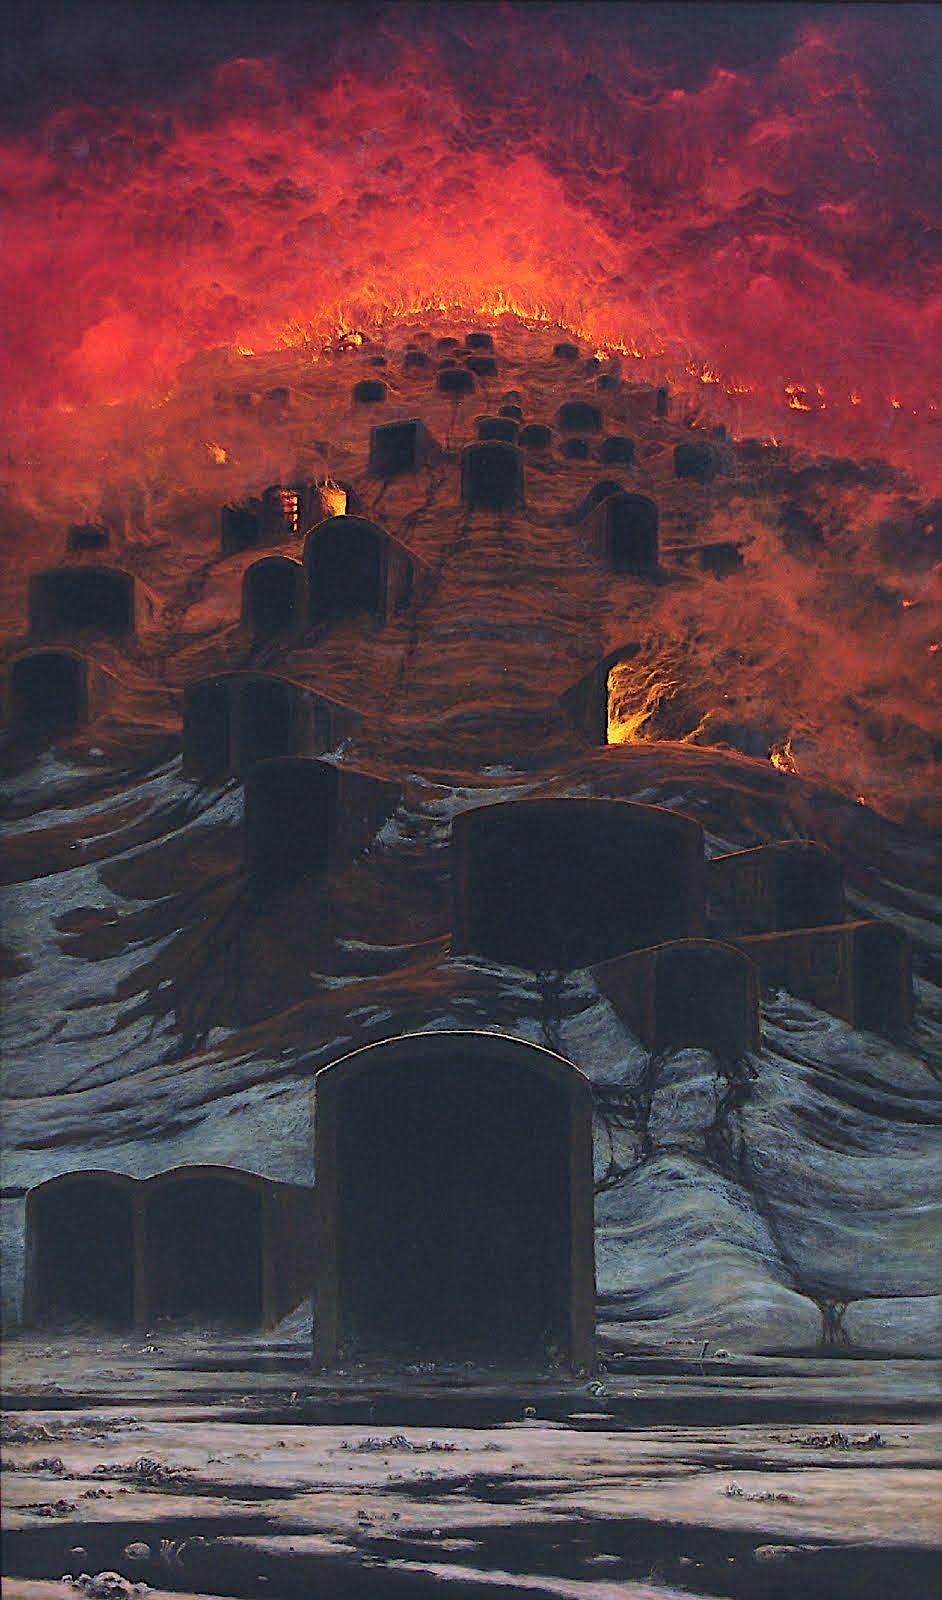 Jaroslav Panuska Triskelion, a burning cemetary hill in flames